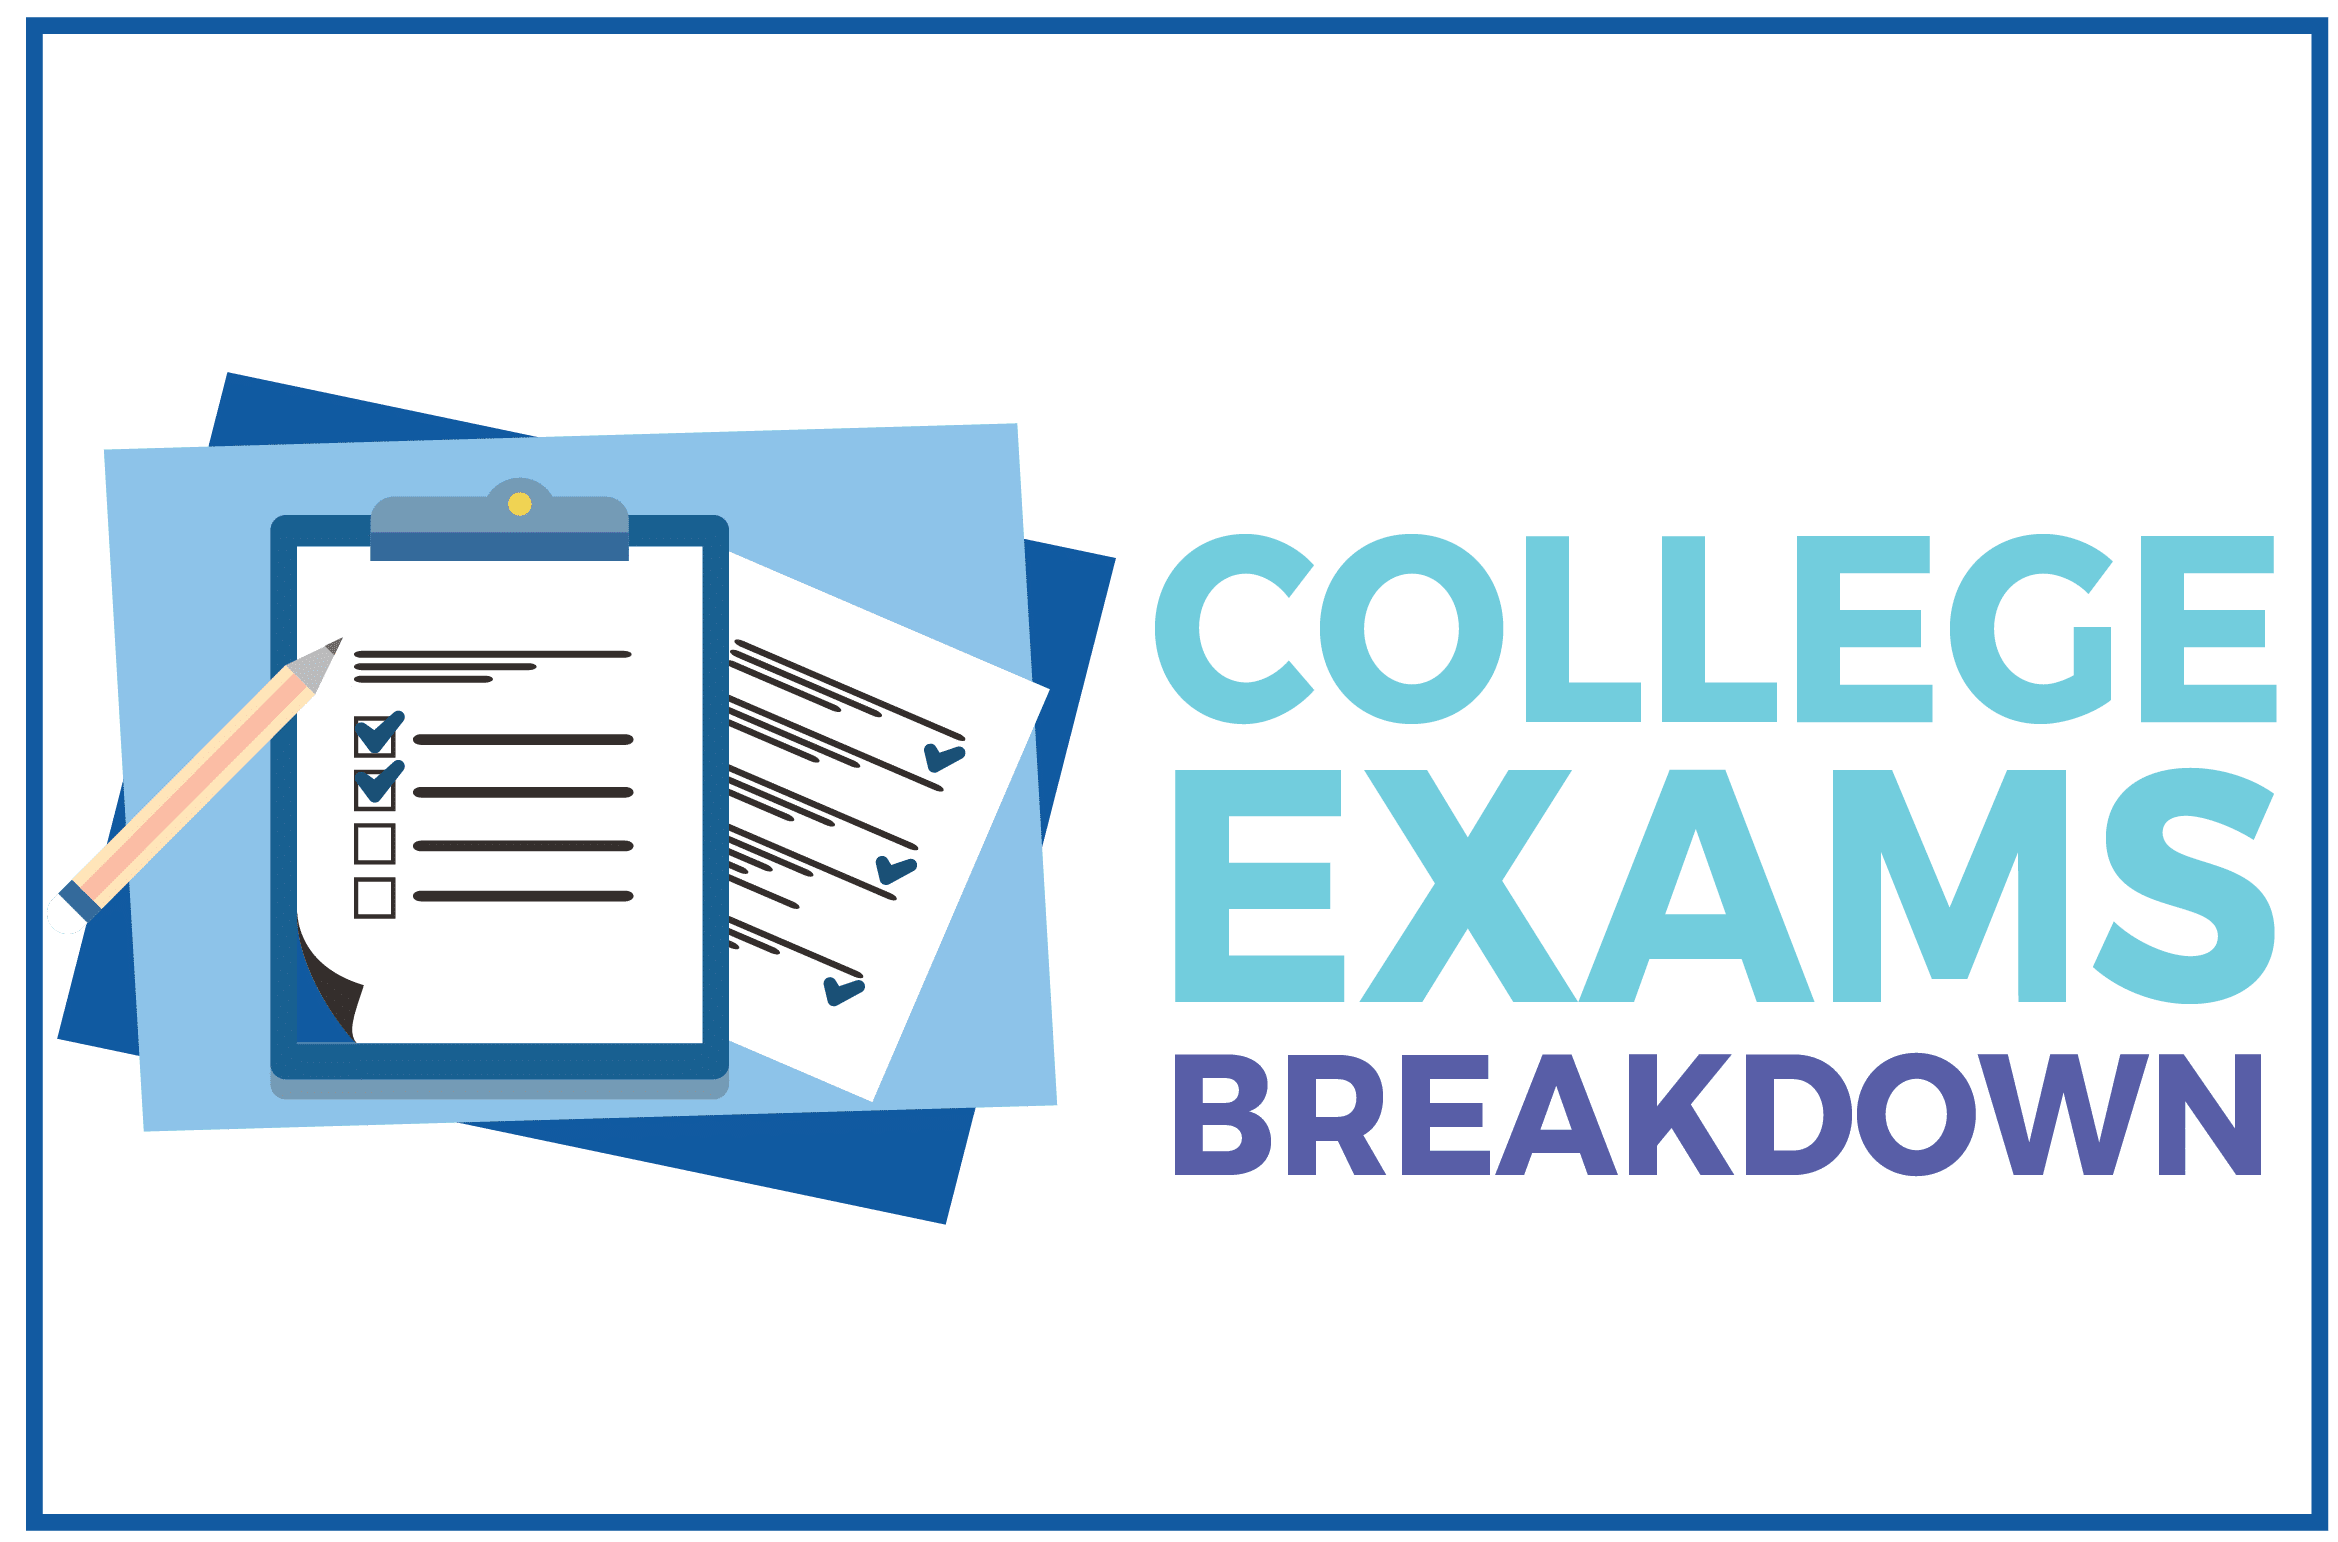 College Exams Breakdown